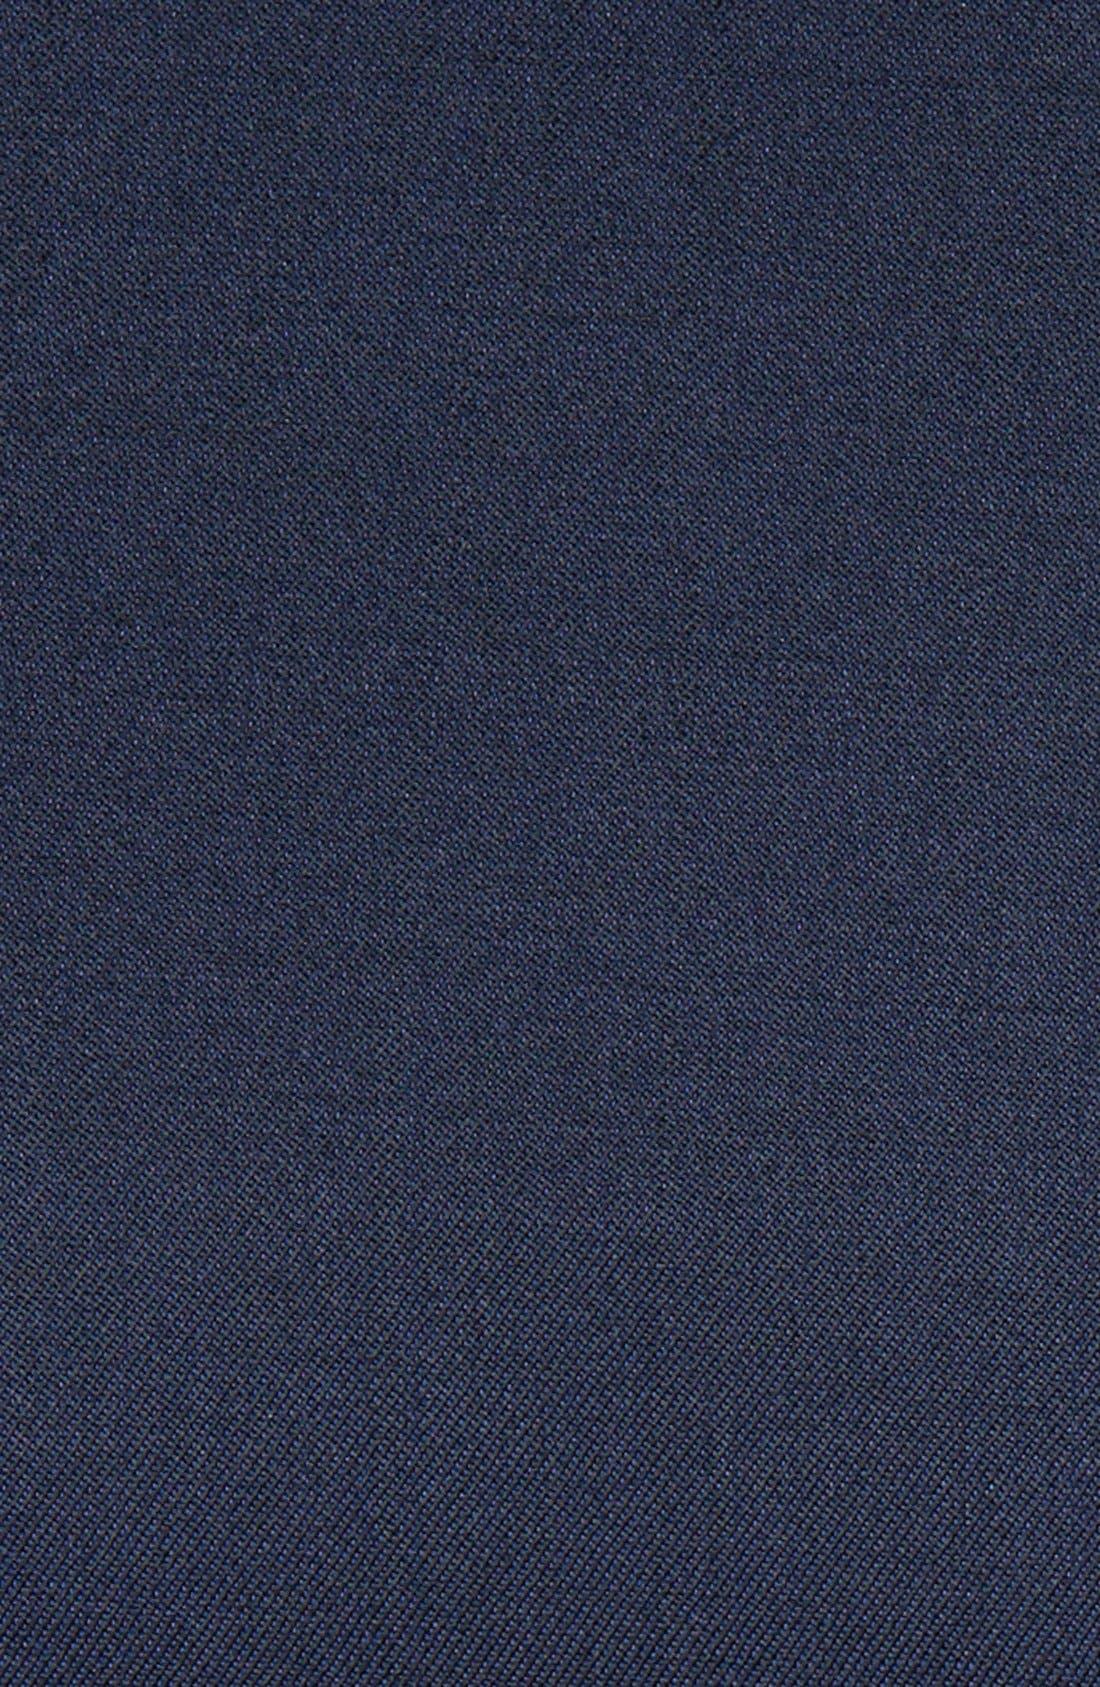 'Josh' Trim Fit Navy Shawl Lapel Tuxedo,                             Alternate thumbnail 9, color,                             NAVY BLUE